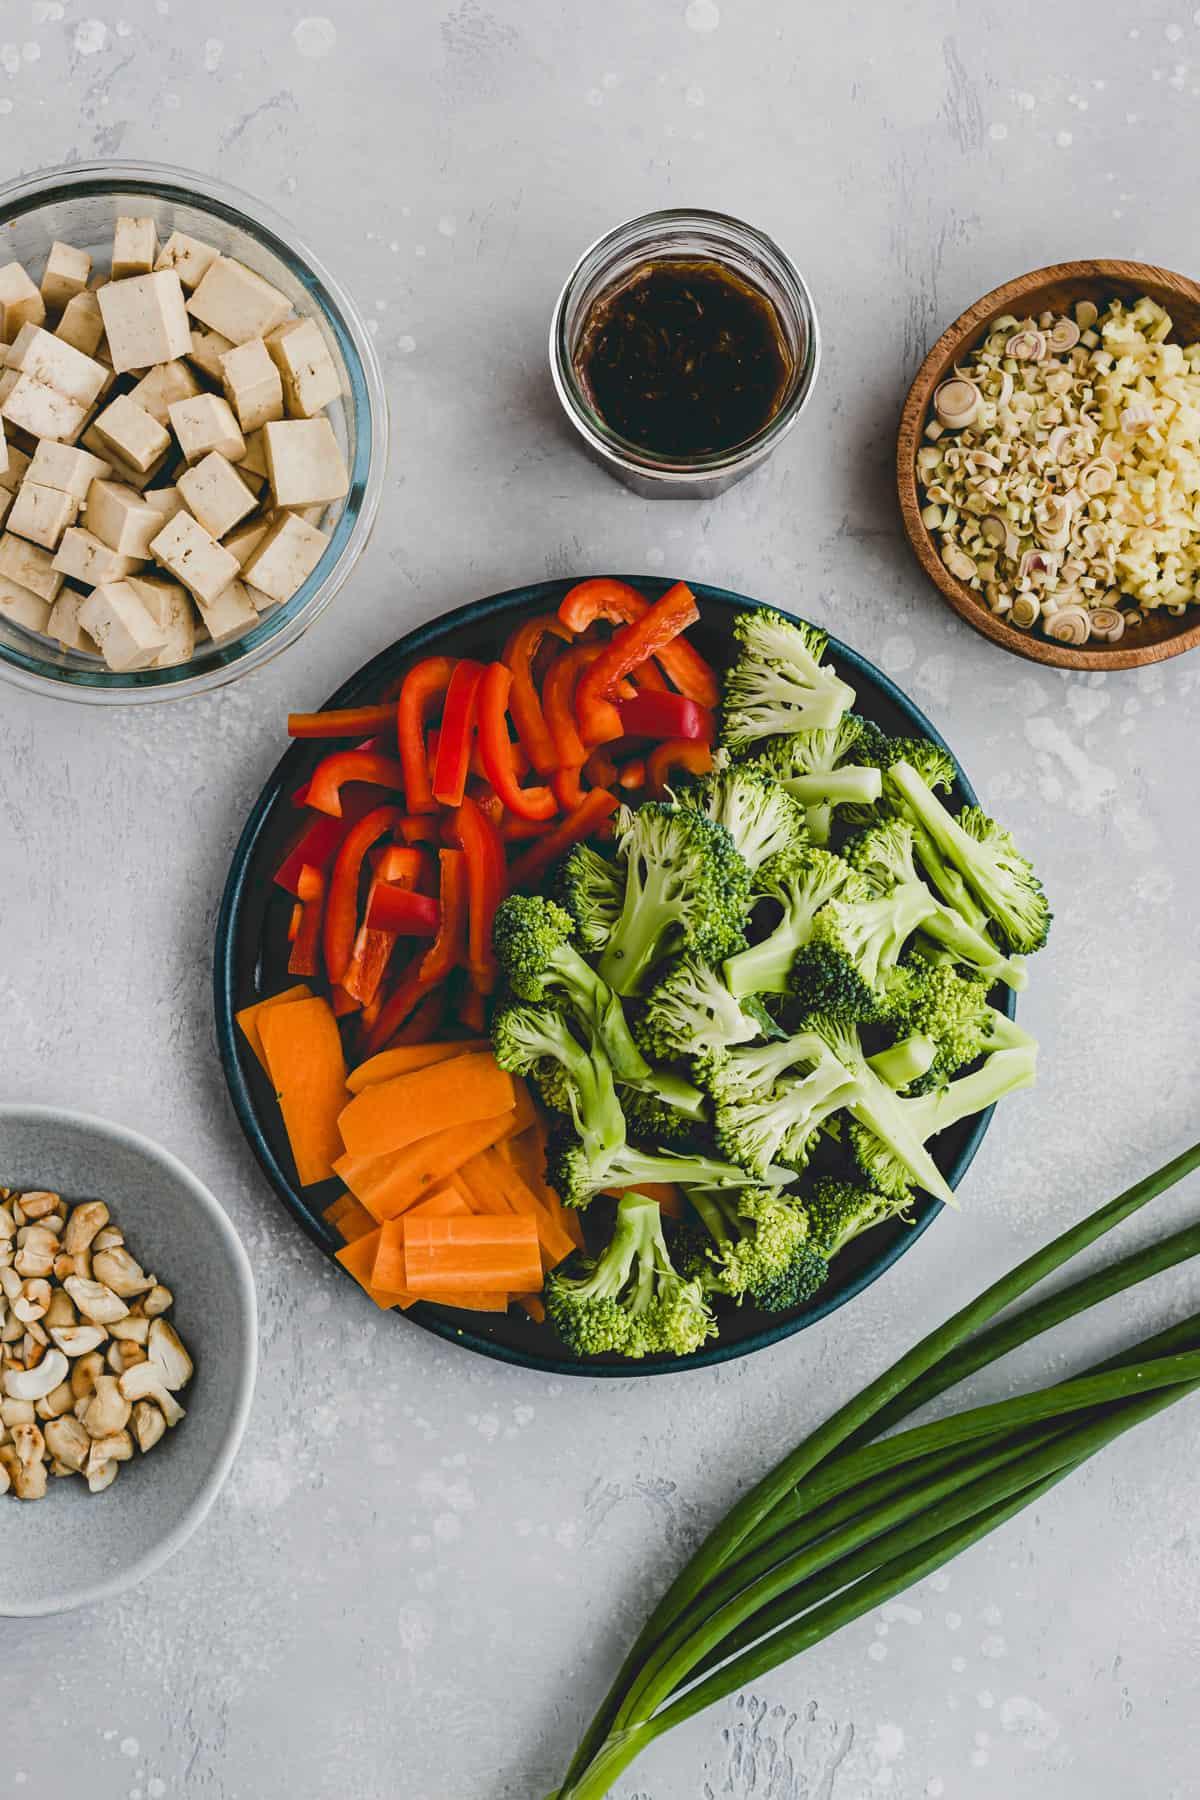 ingredients for tofu stir fry